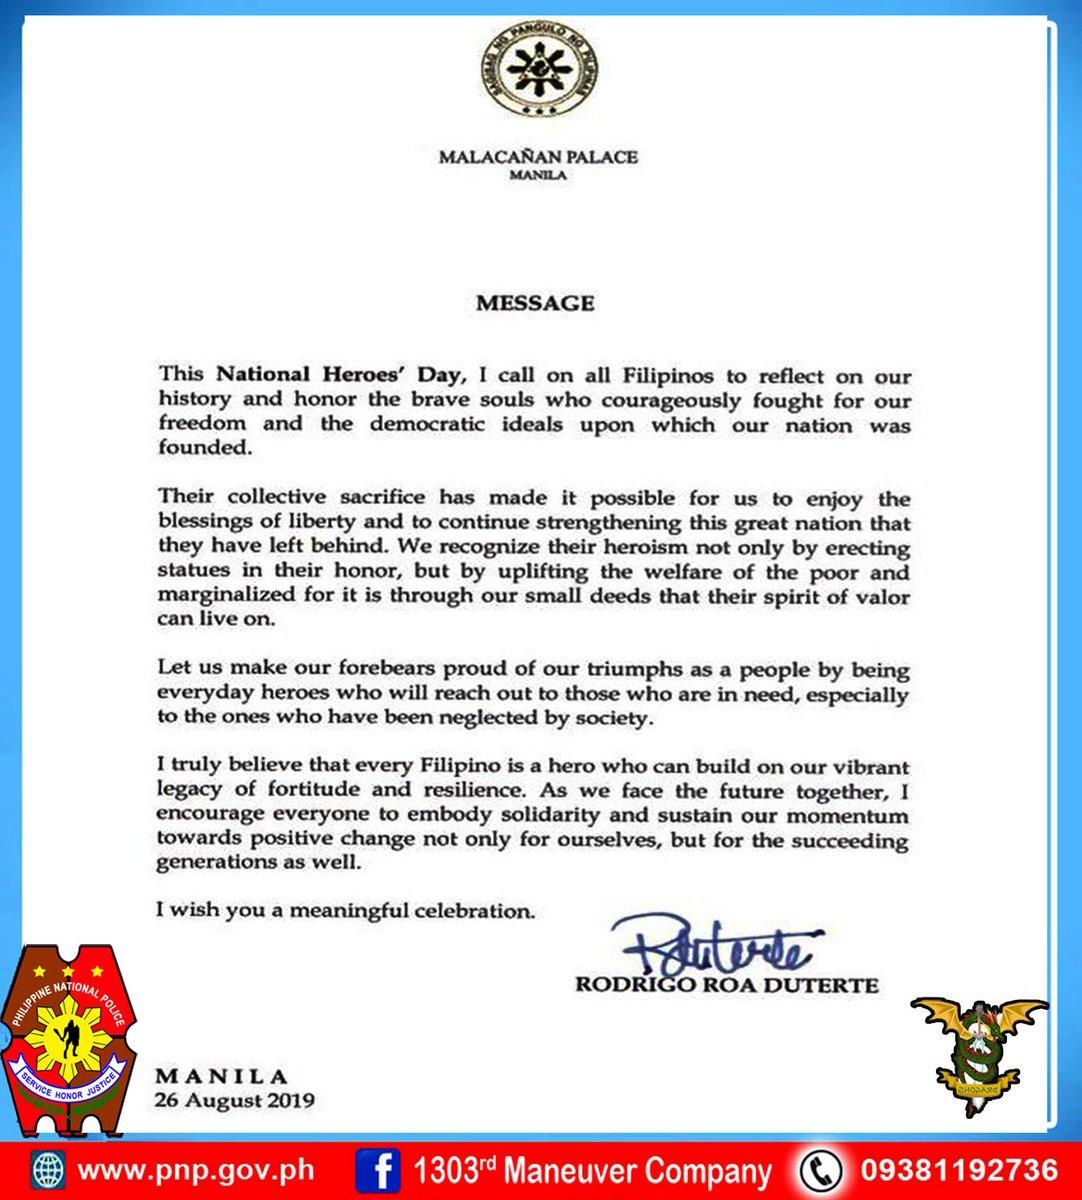 ATTENTION: Presidents Message Today National Heroes Day 2019.  #PNPpulisumaksyonmabilis #PNPpulisAtKomunidad #PNPtoserve&protect #PNPinformsPublic #NationalHeroesDay2019 #SaluteToOurHeroes. https://t.co/StWzGUnmGl